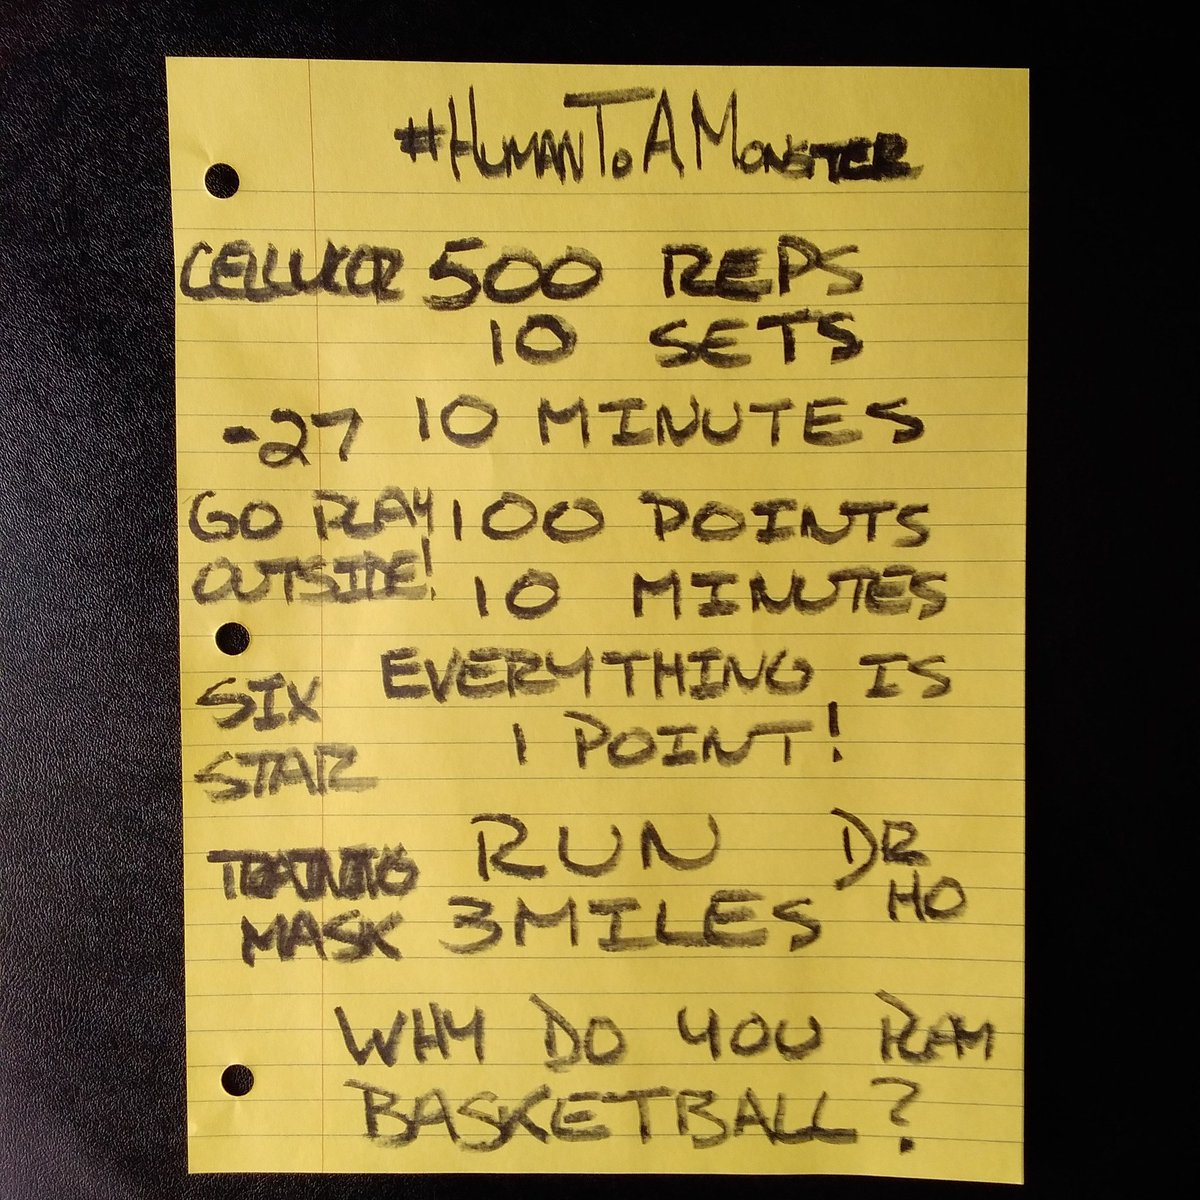 #HumanToAMonster  @SixStarPro @cellucorC4 @TrainingMask @Spotify  @YouTube   #TuesdayMotivations #Basketball